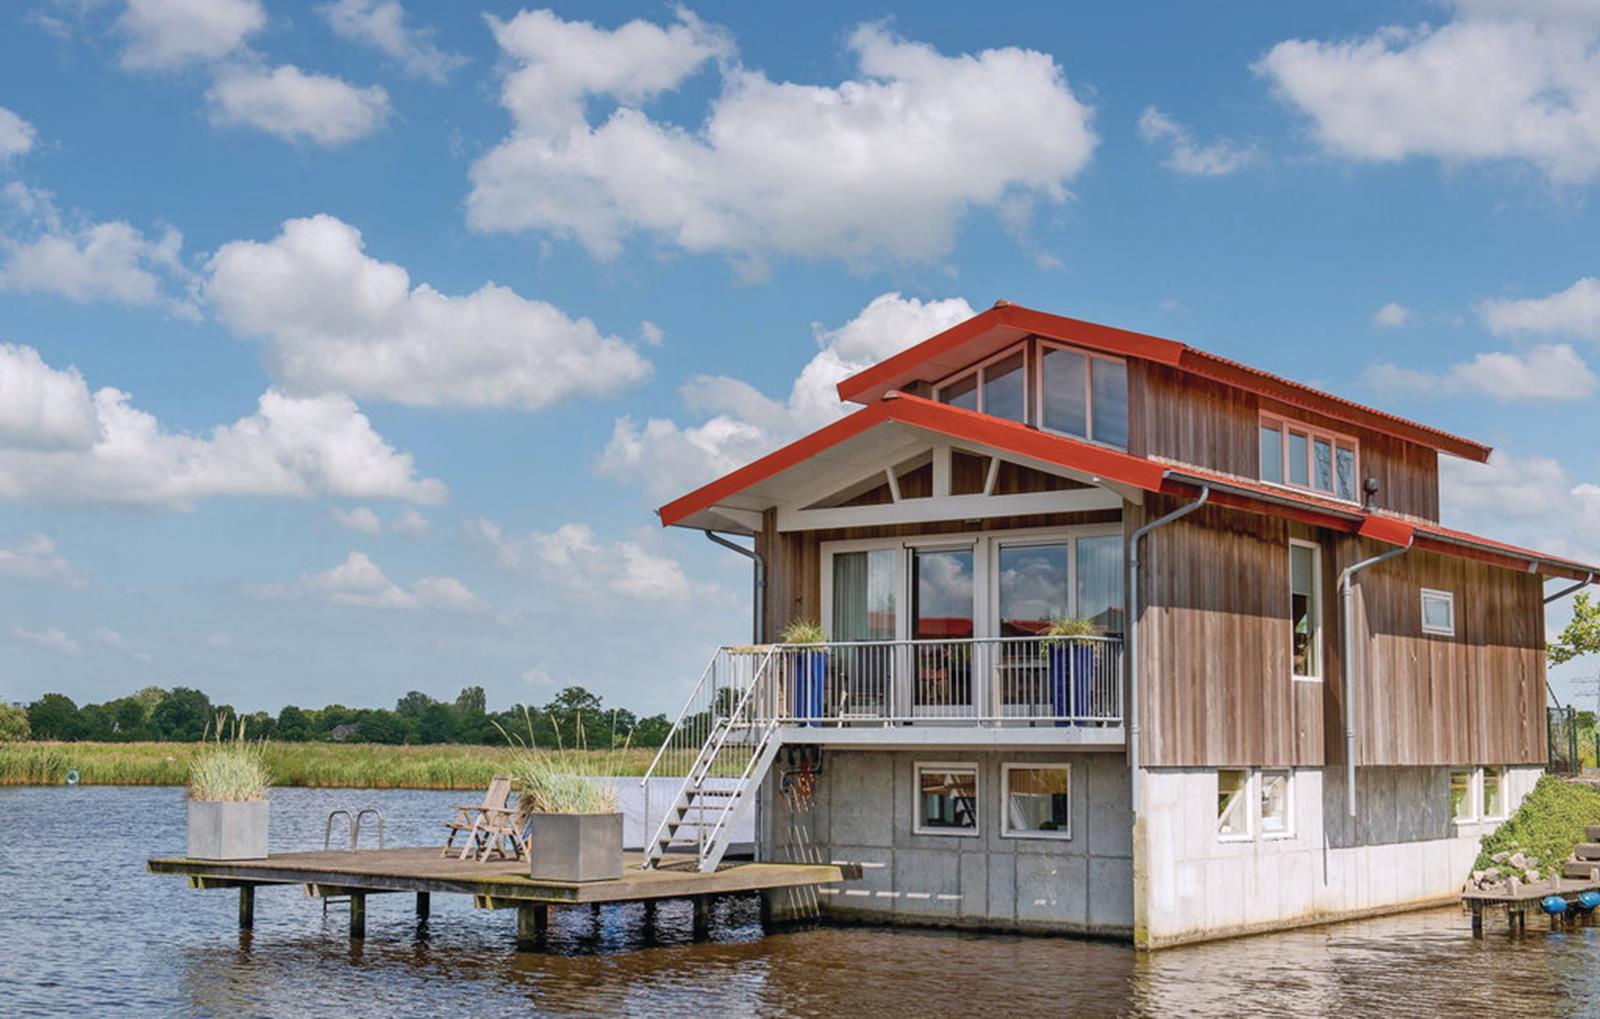 Vakantiehuis te koop Friesland Noardburgum 023.jpg